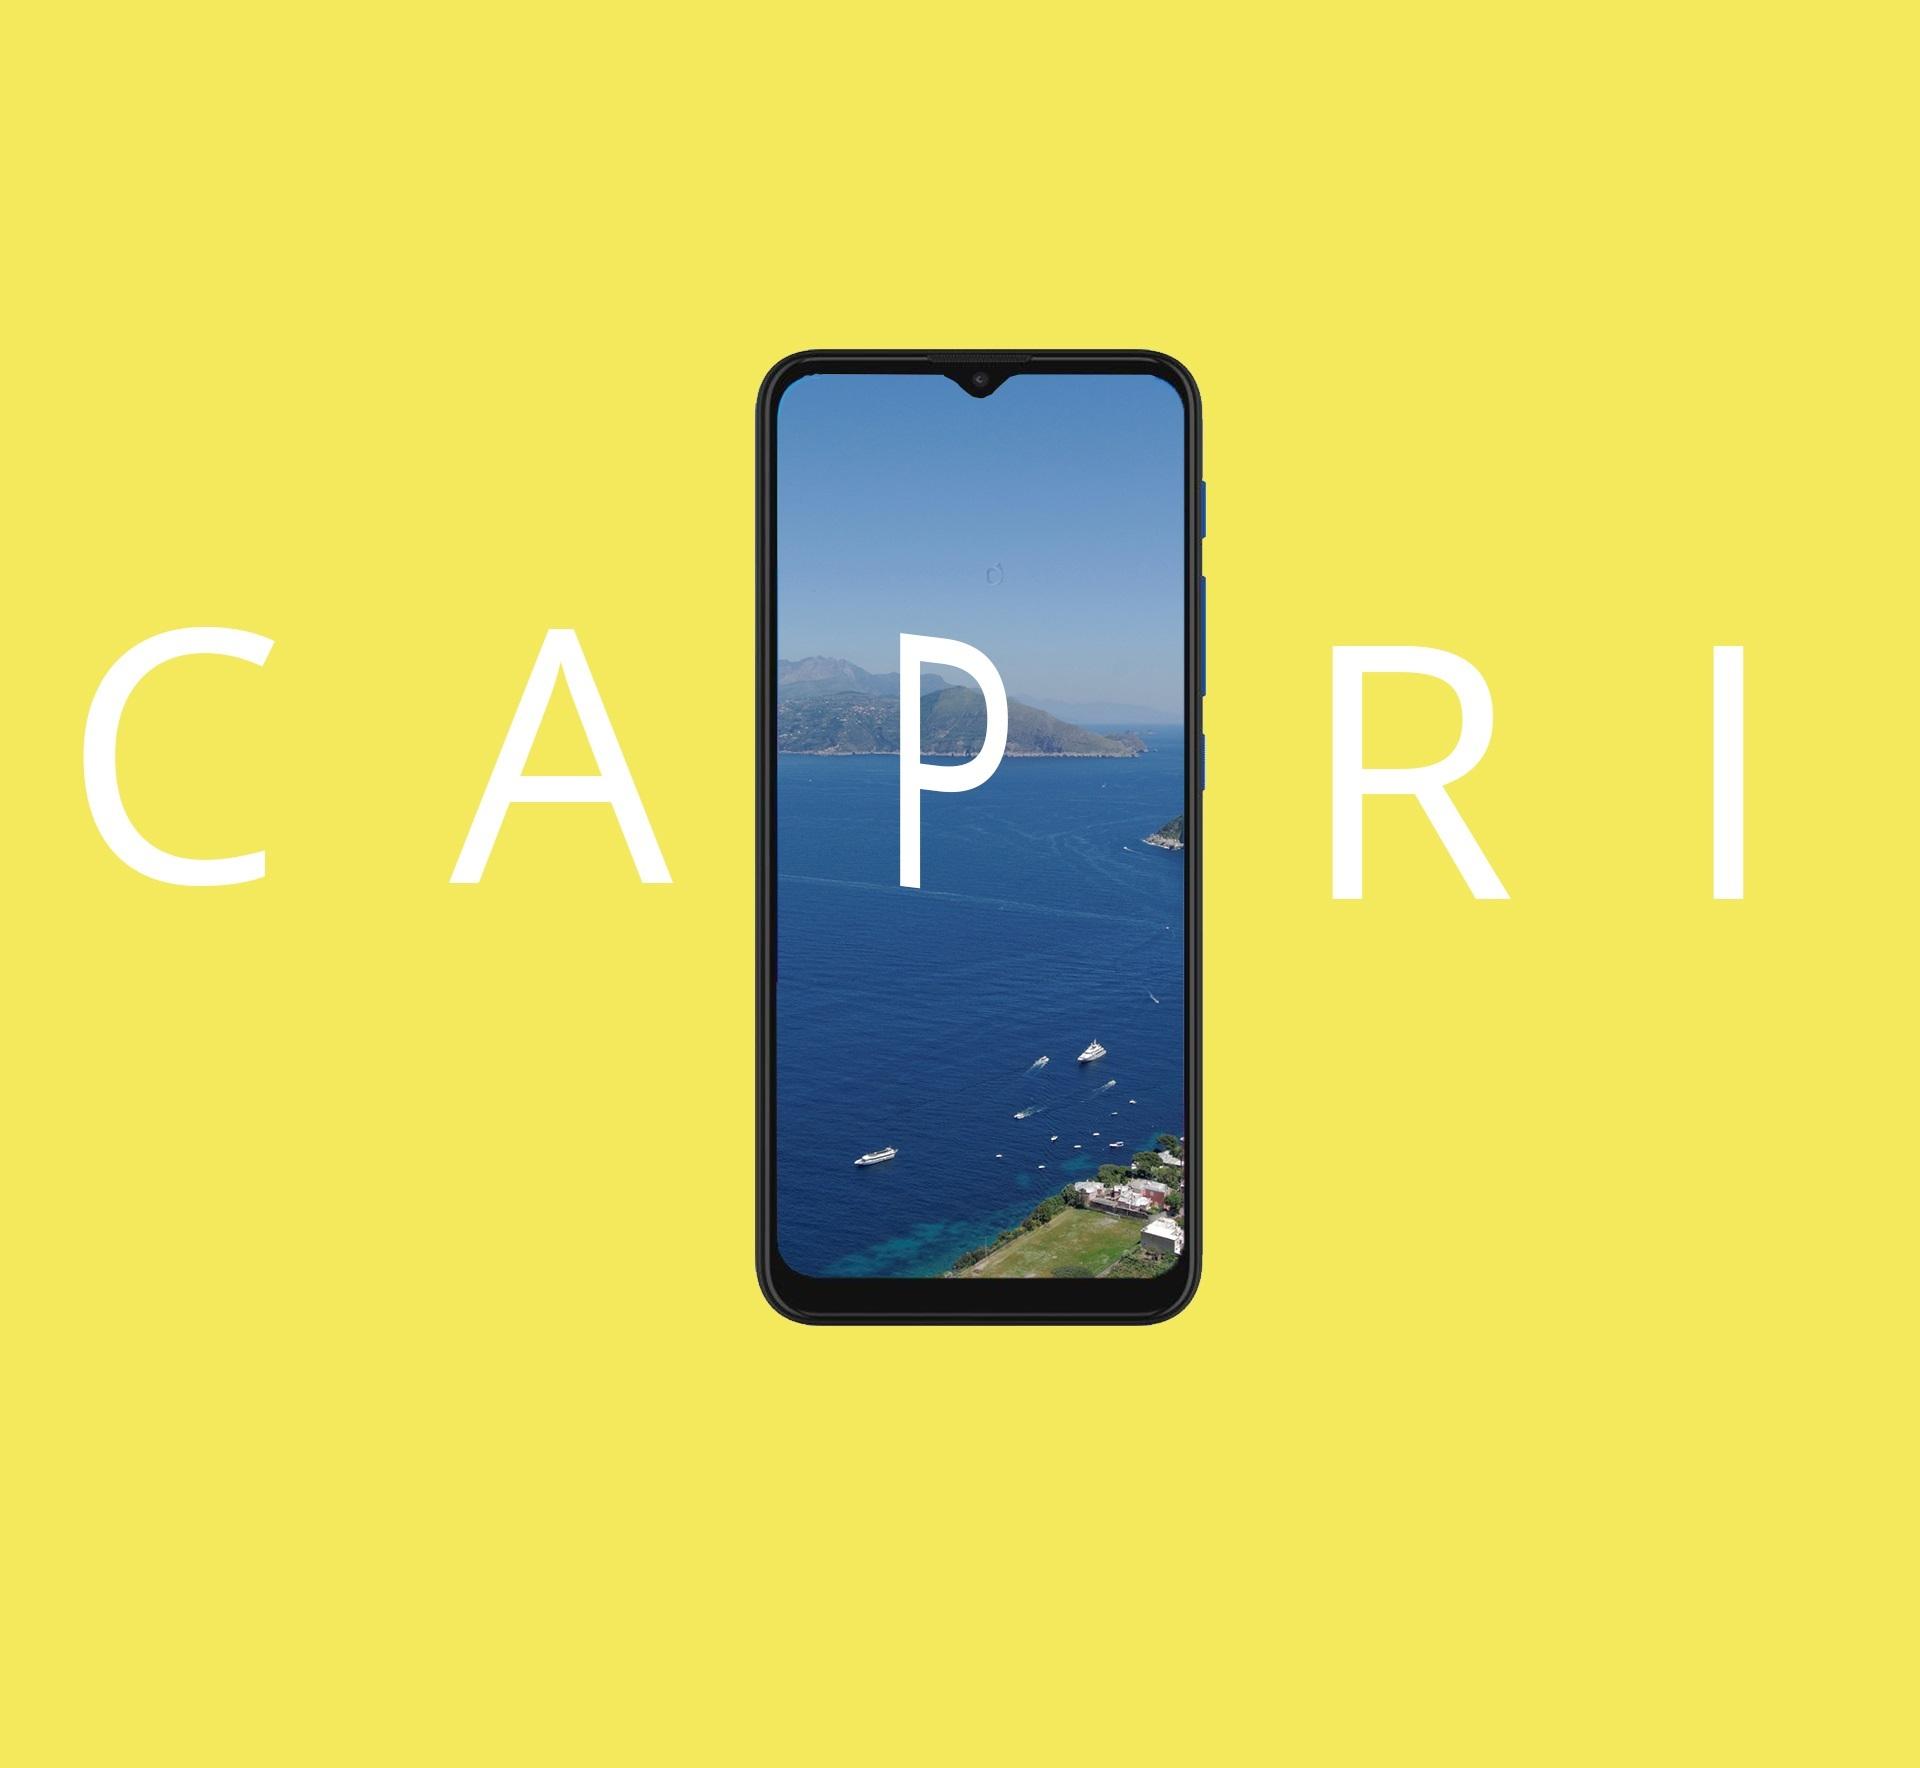 Motorola G30 Capri